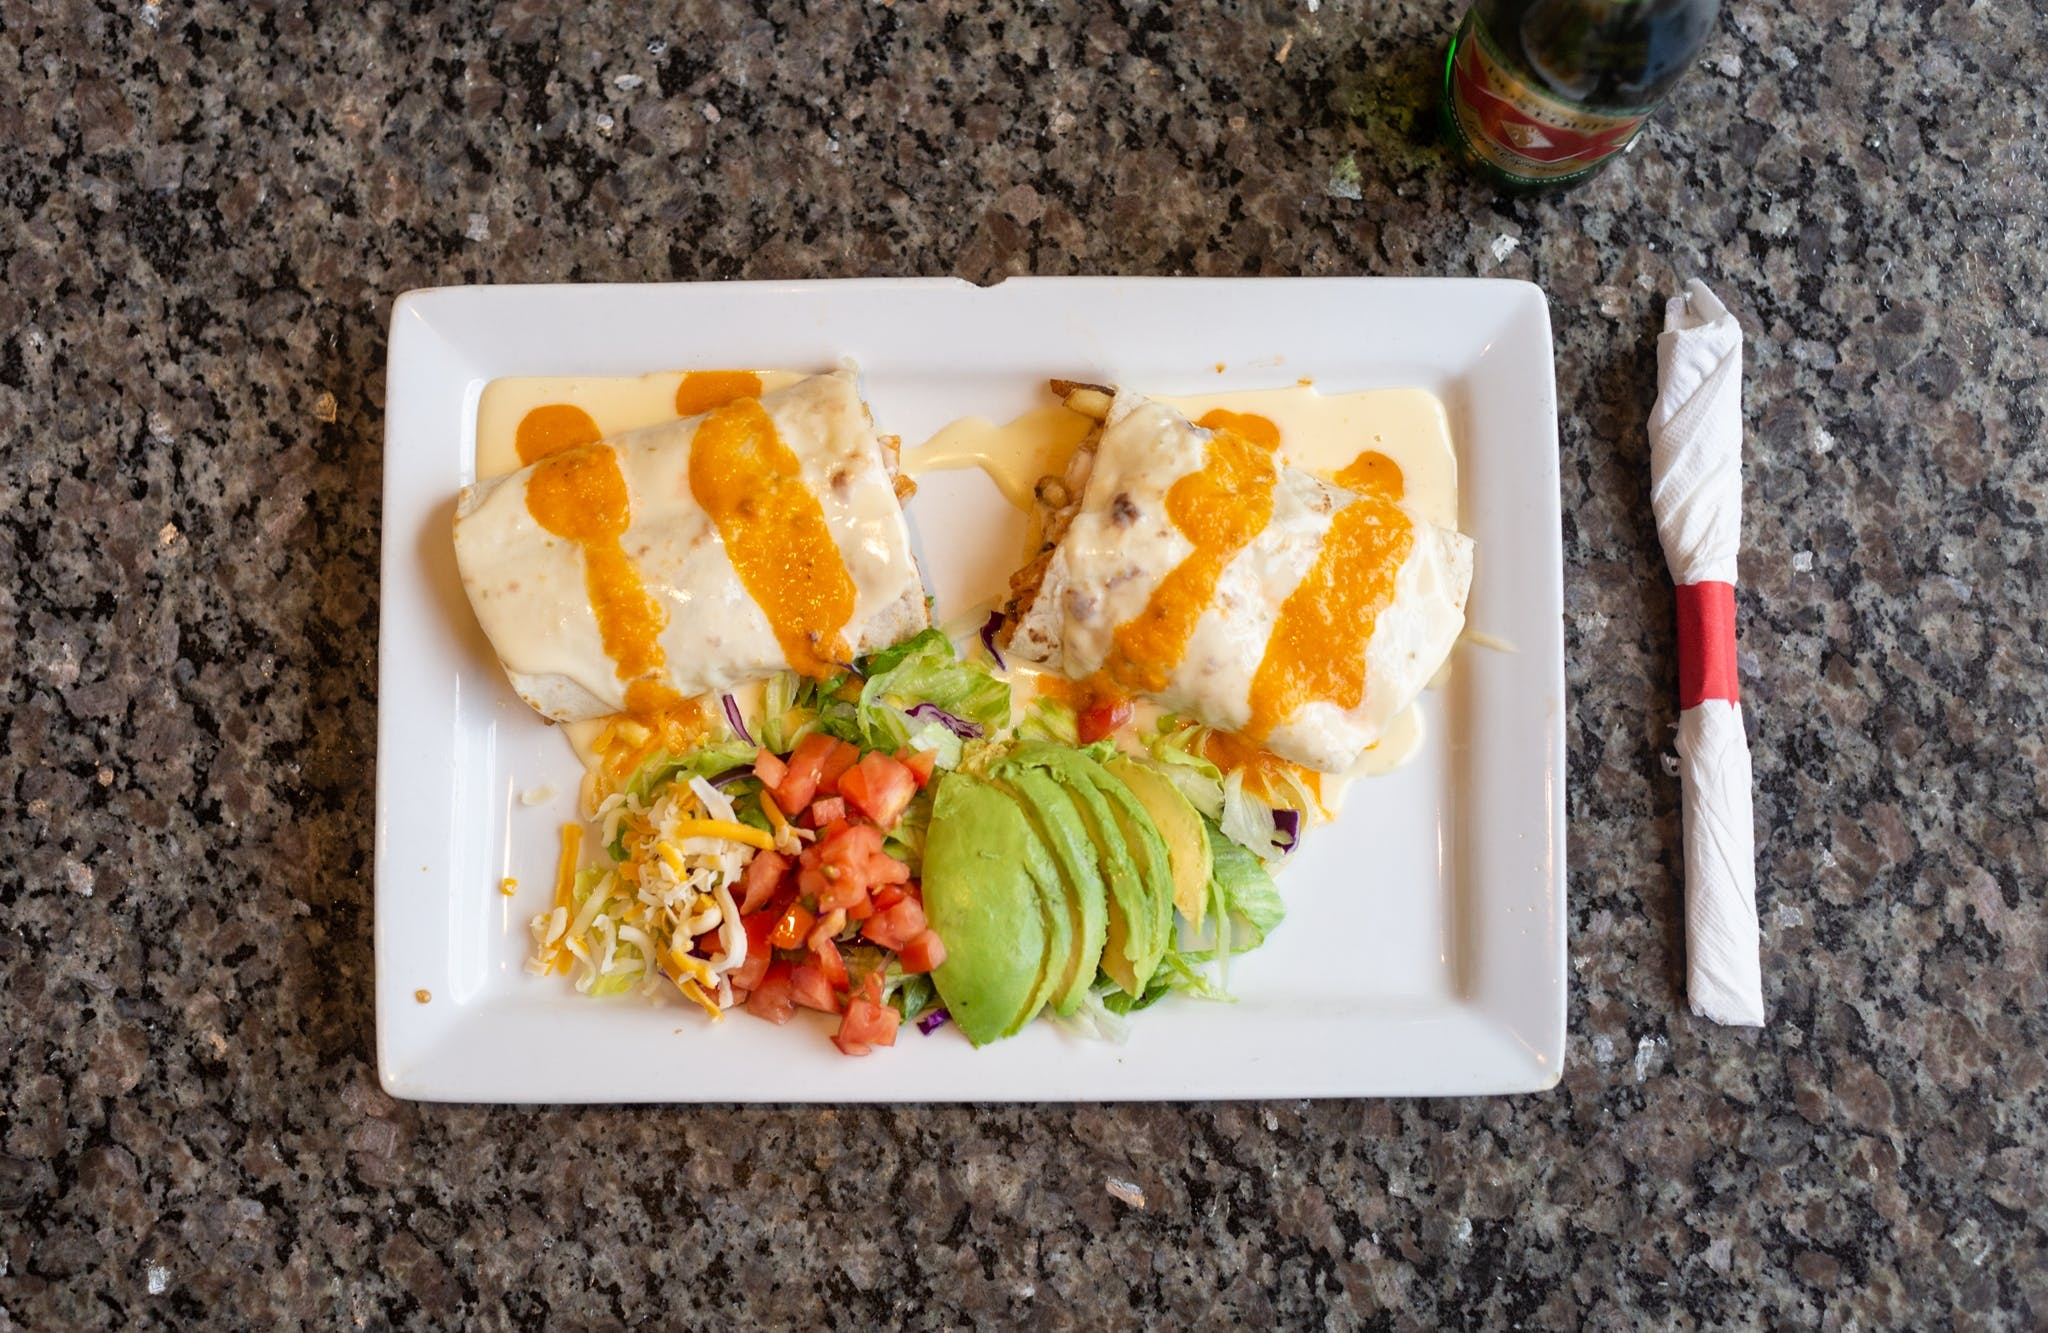 Burrito Mezcal from El Mezcal in Lawrence, KS